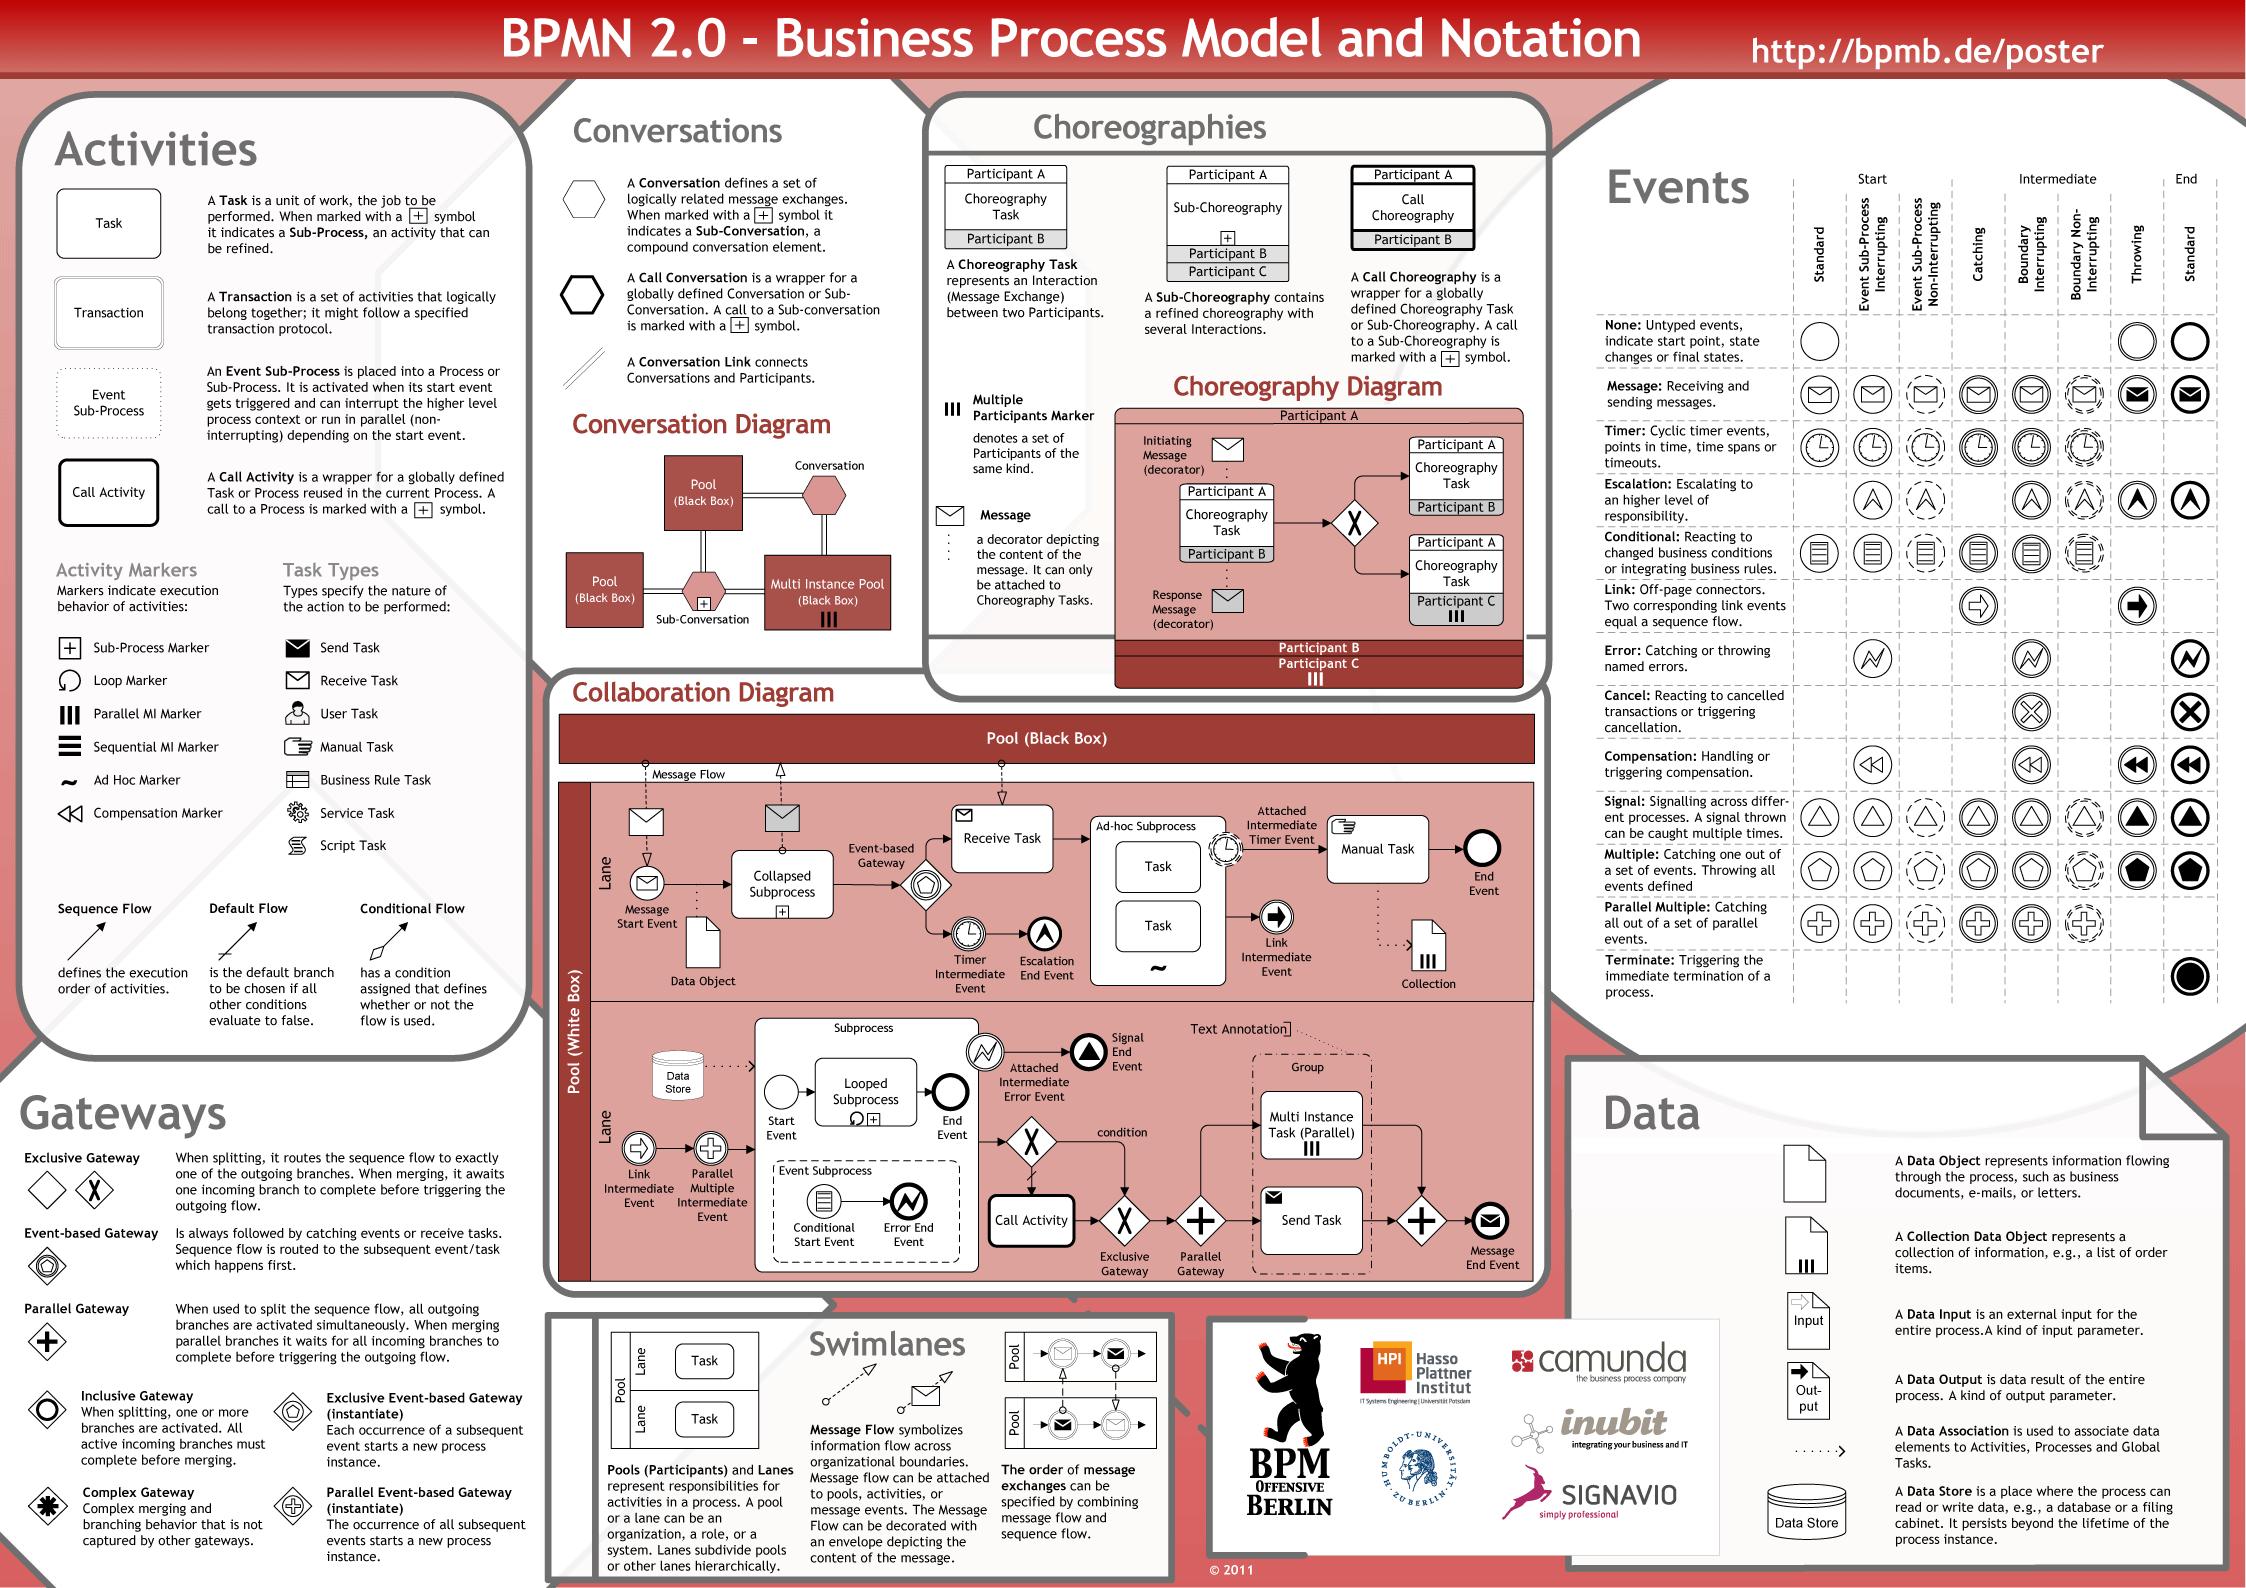 bpmn 20 poster en preview image - Bpmn 20 Standard